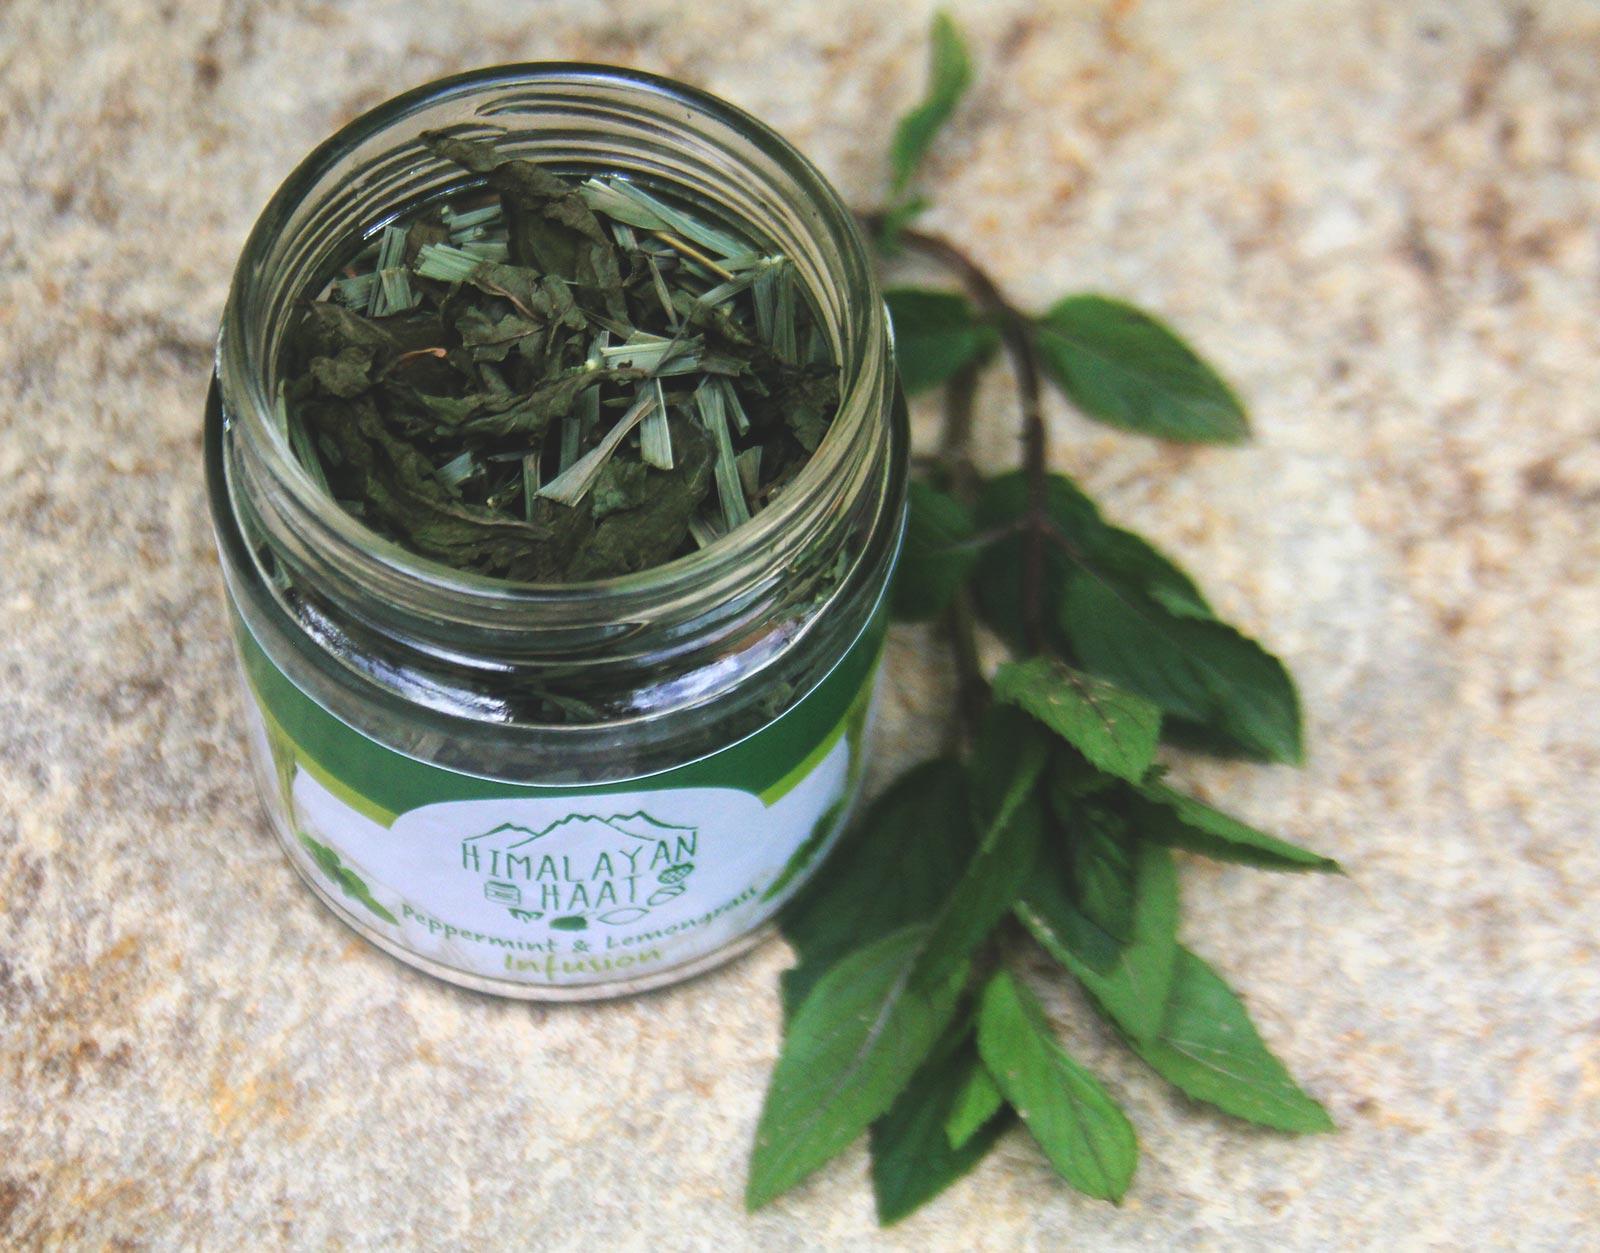 peppermint-and-lemongrass-herbal-tea-immunity-boosting